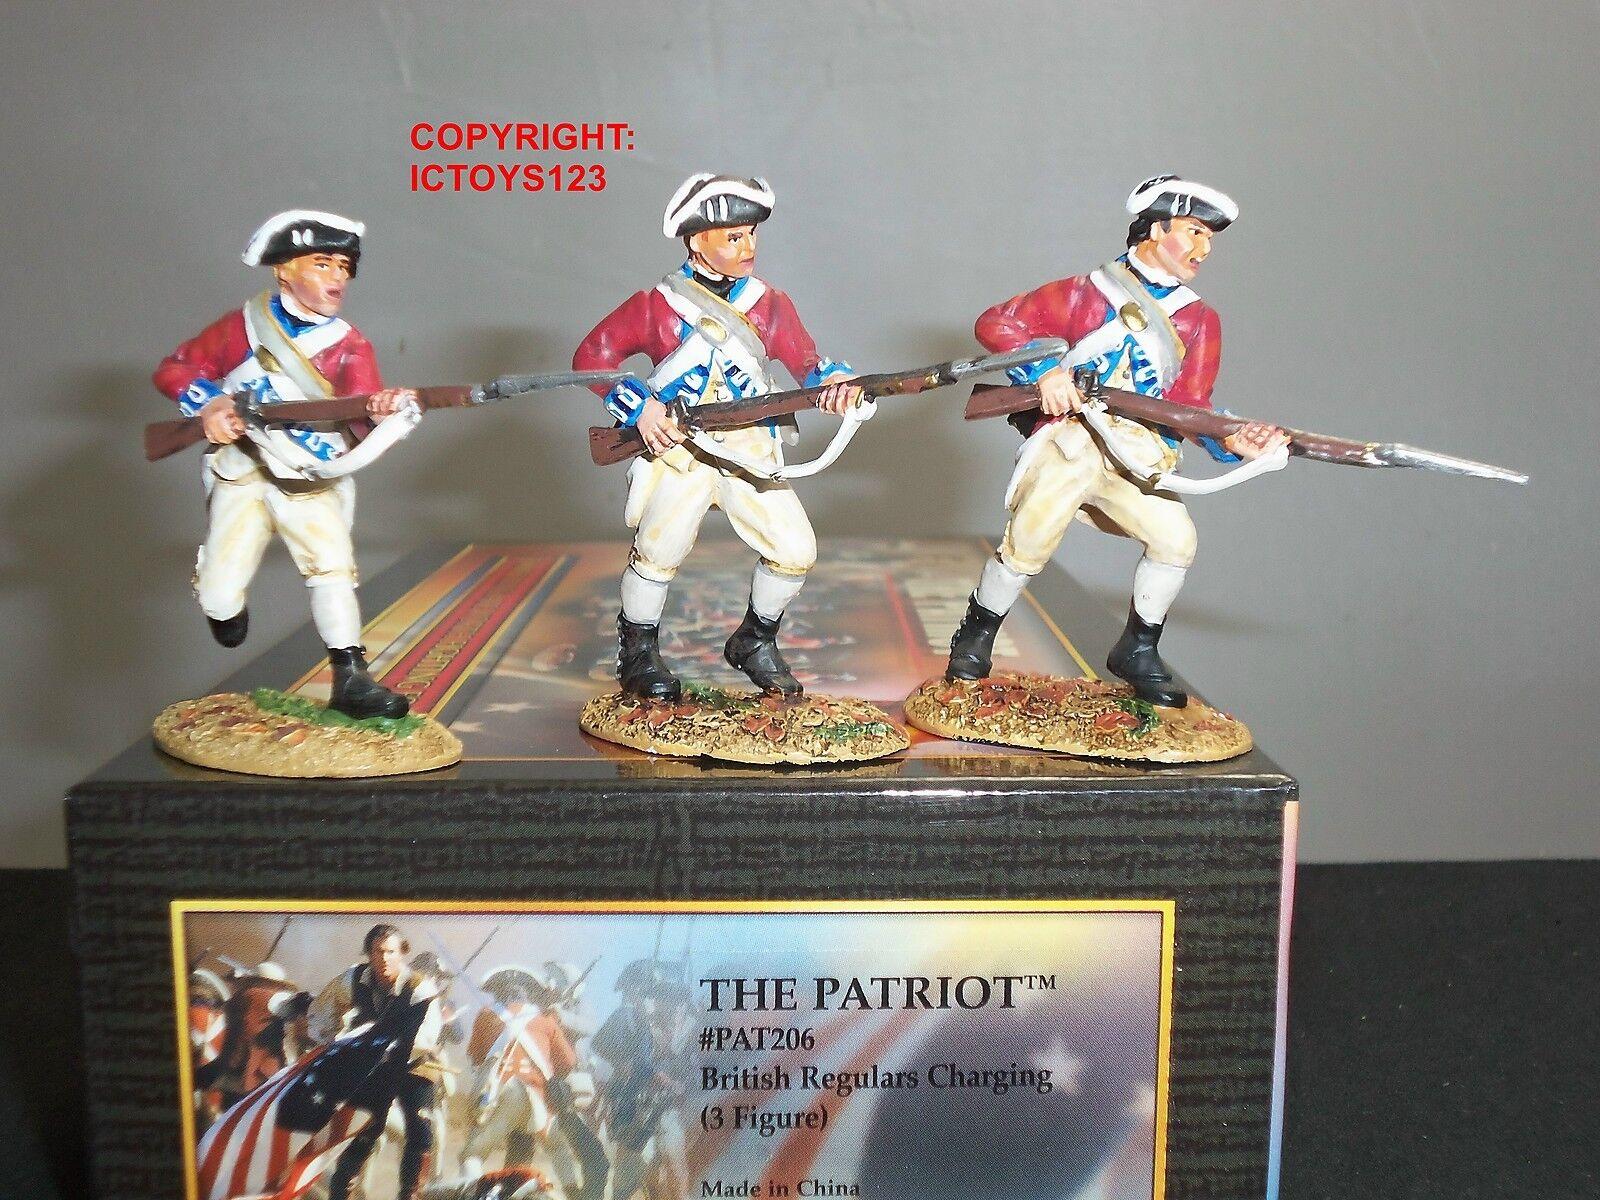 CONTE PAT206 PATRIOT BRITISH REGULARS CHARGING METAL TOY SOLDIER FIGURE SET